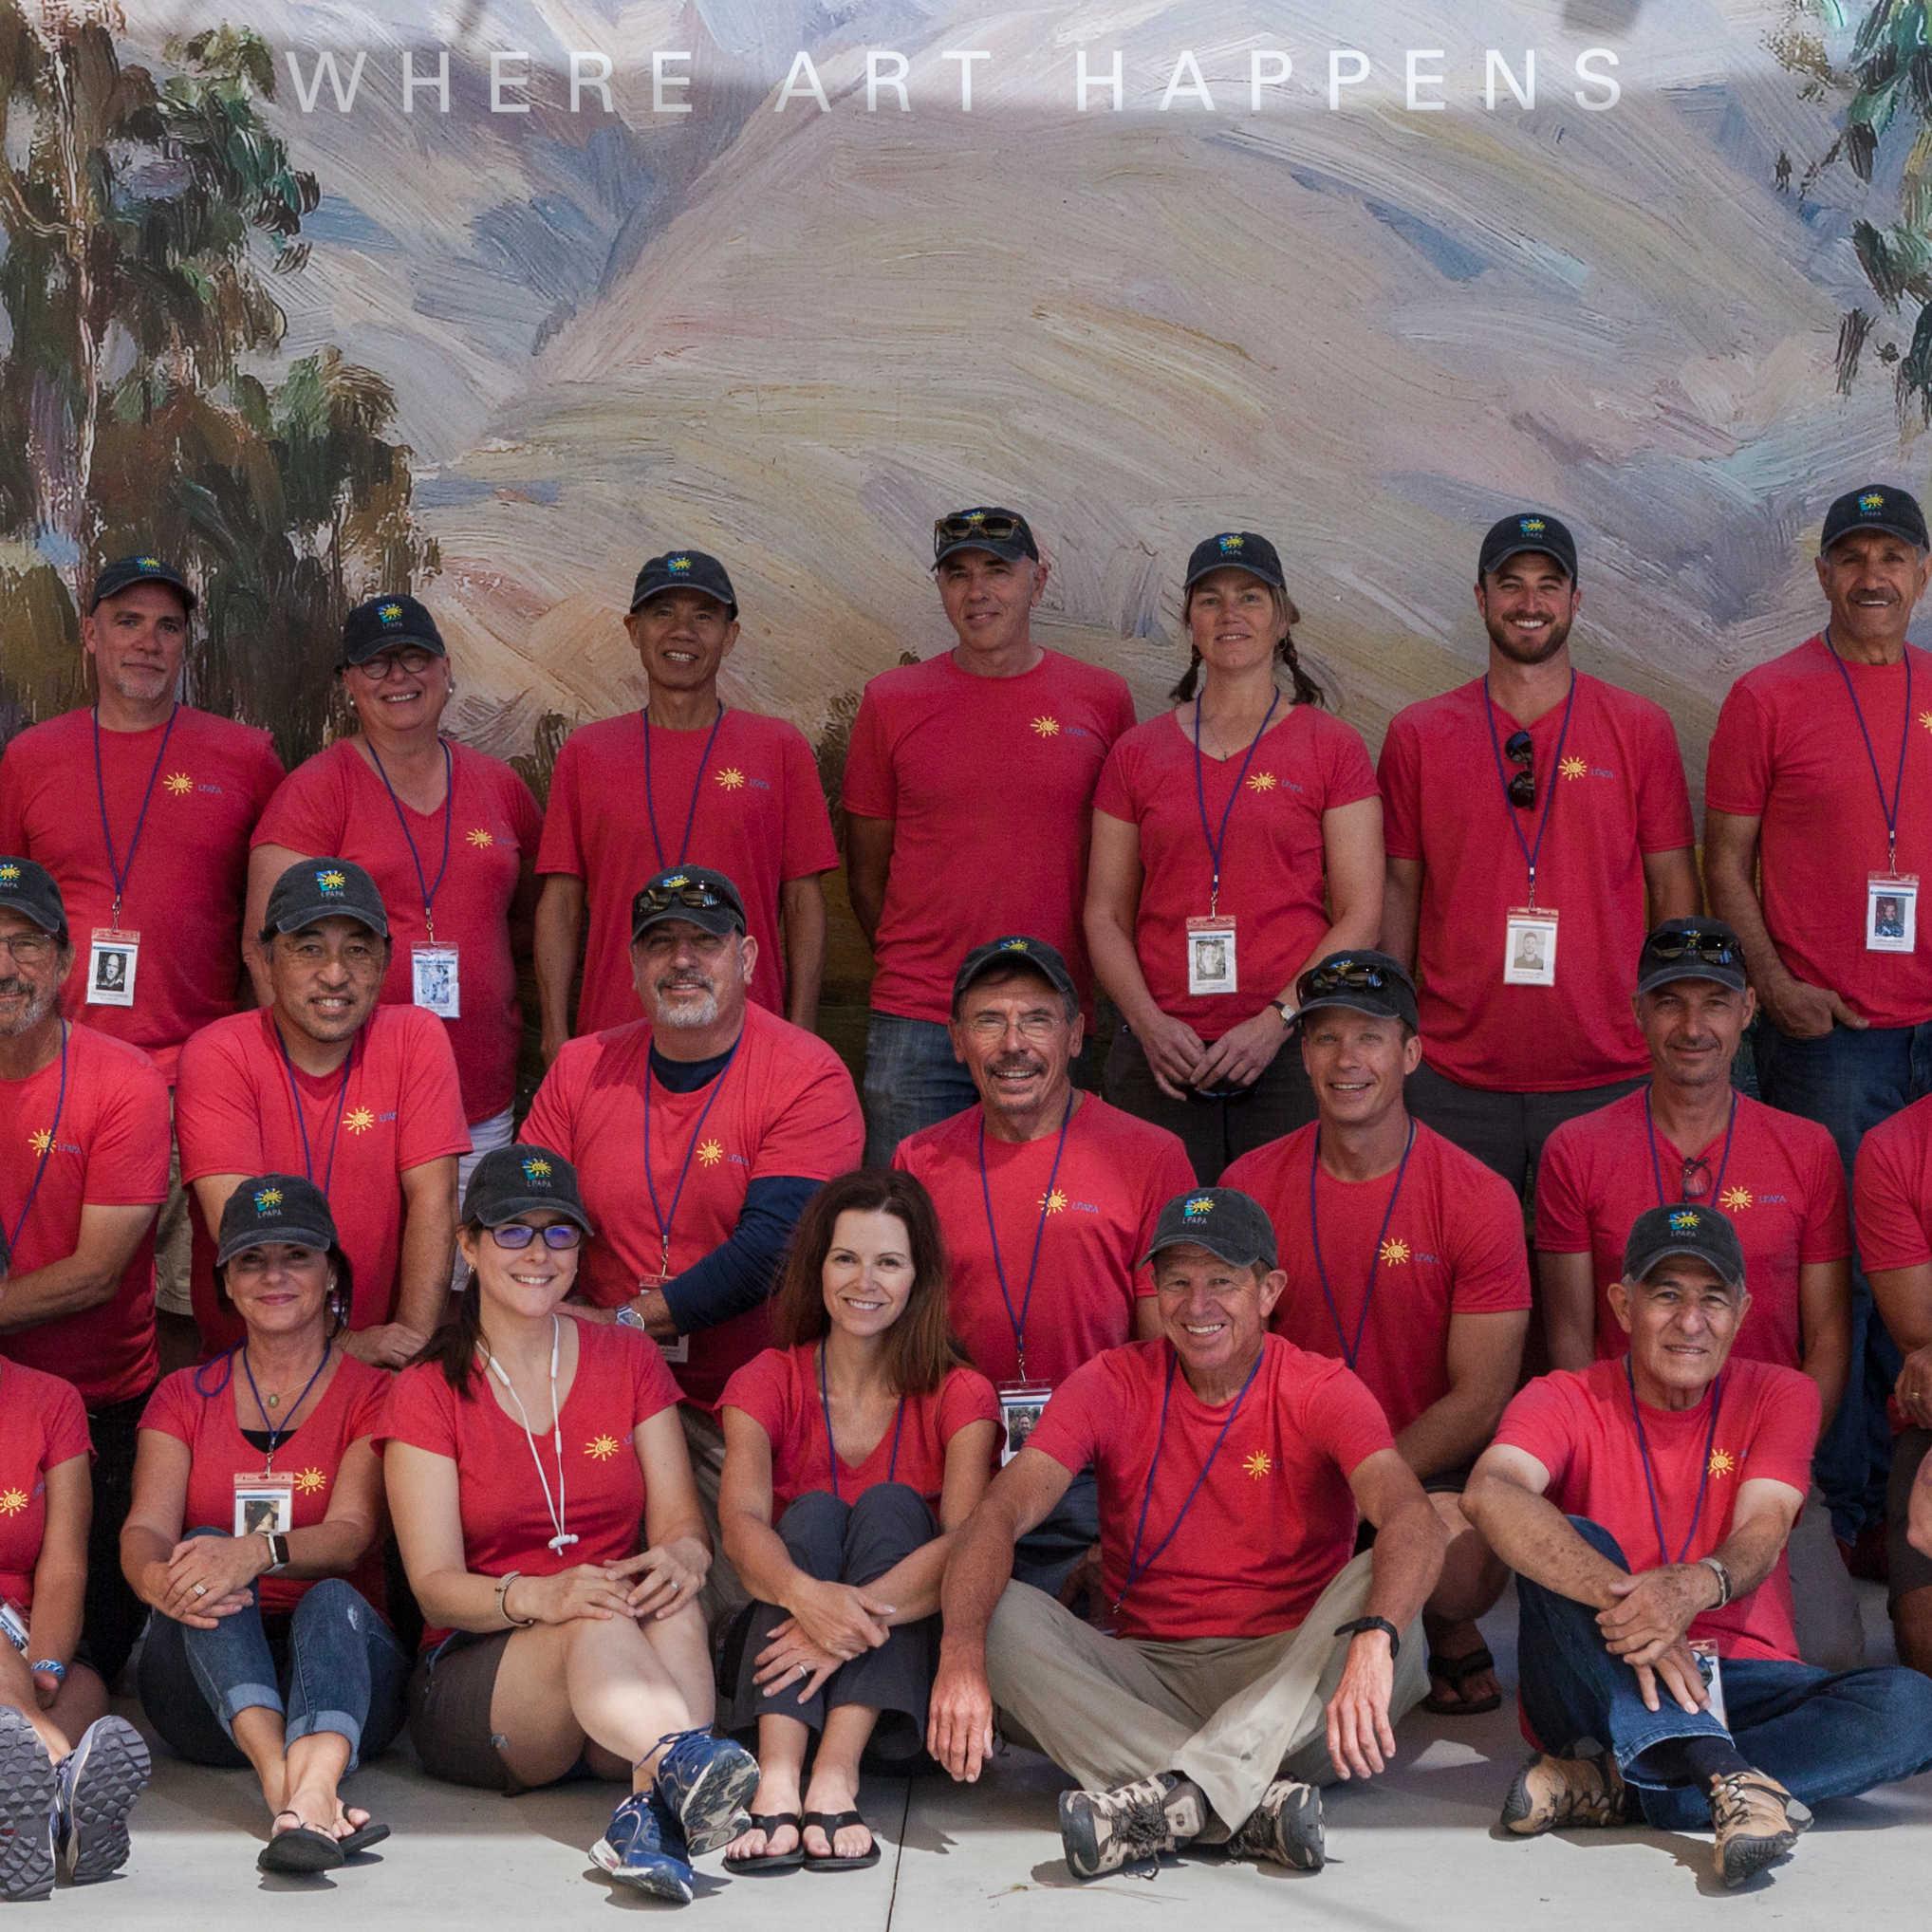 2019 Laguna Invitational Group Photo